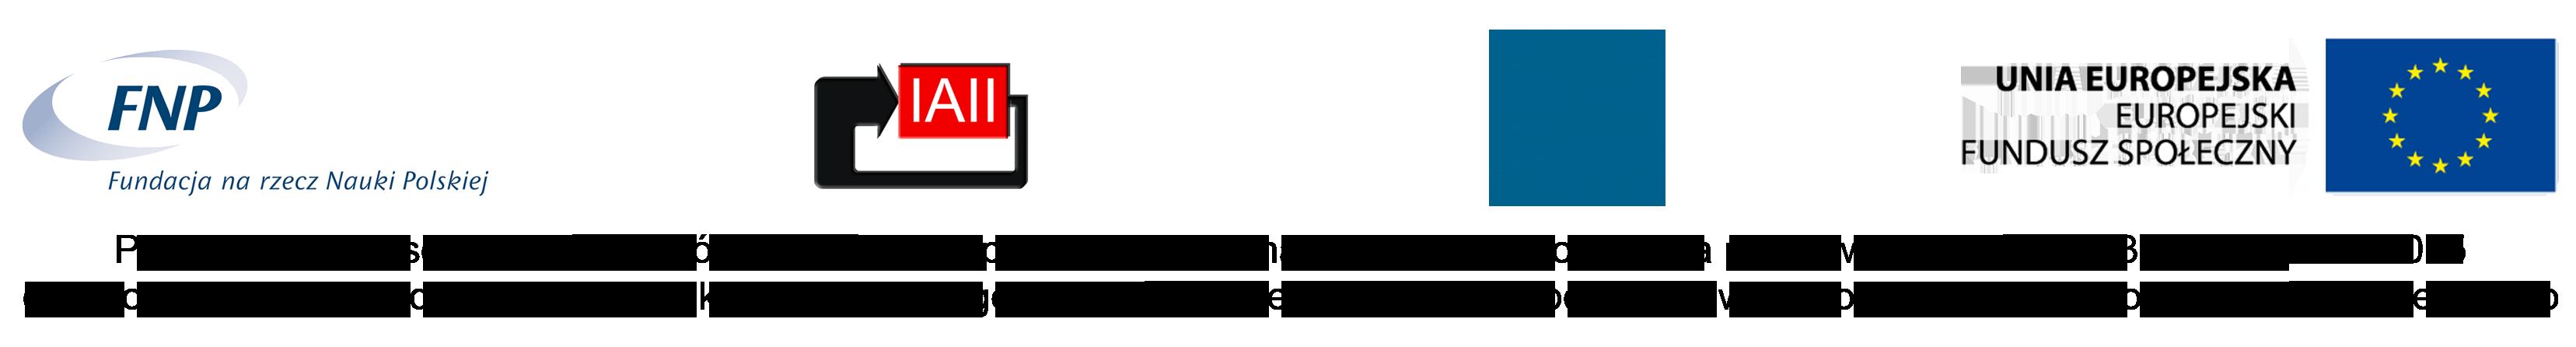 pasek loga